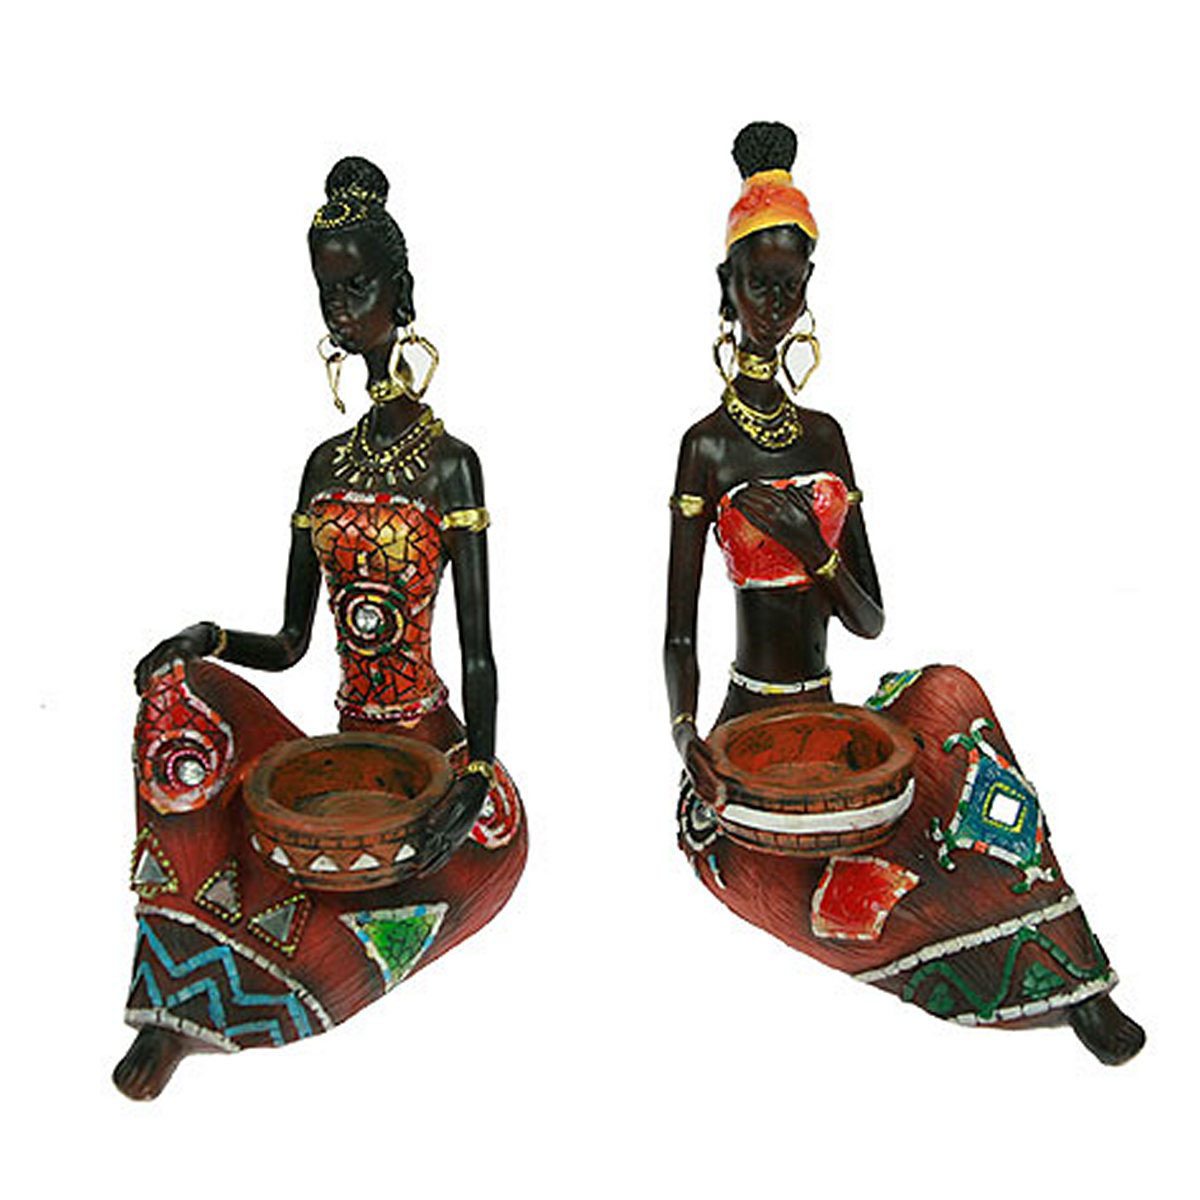 Статуэтка Русские Подарки Африканка, 16 х 10 х 21 см статуэтка русские подарки мисс рандеву 11 х 10 х 31 см